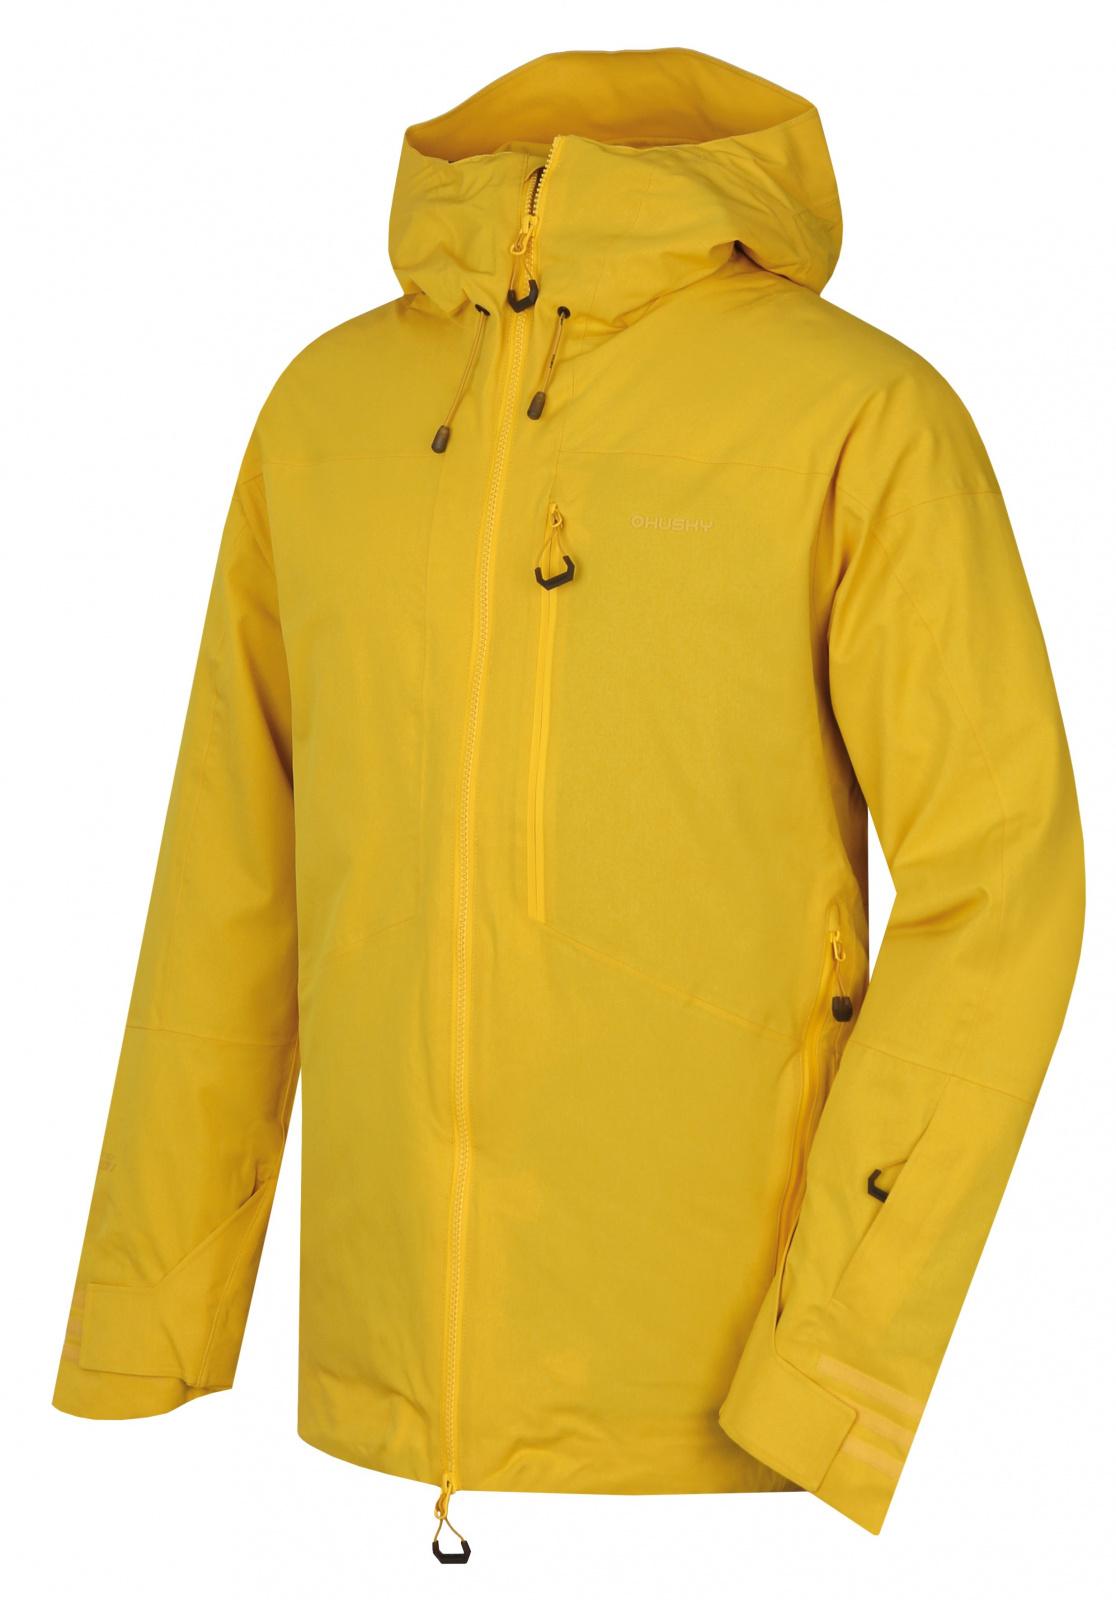 Husky Gomez M žltá, XXL Pánska lyžiarska bunda